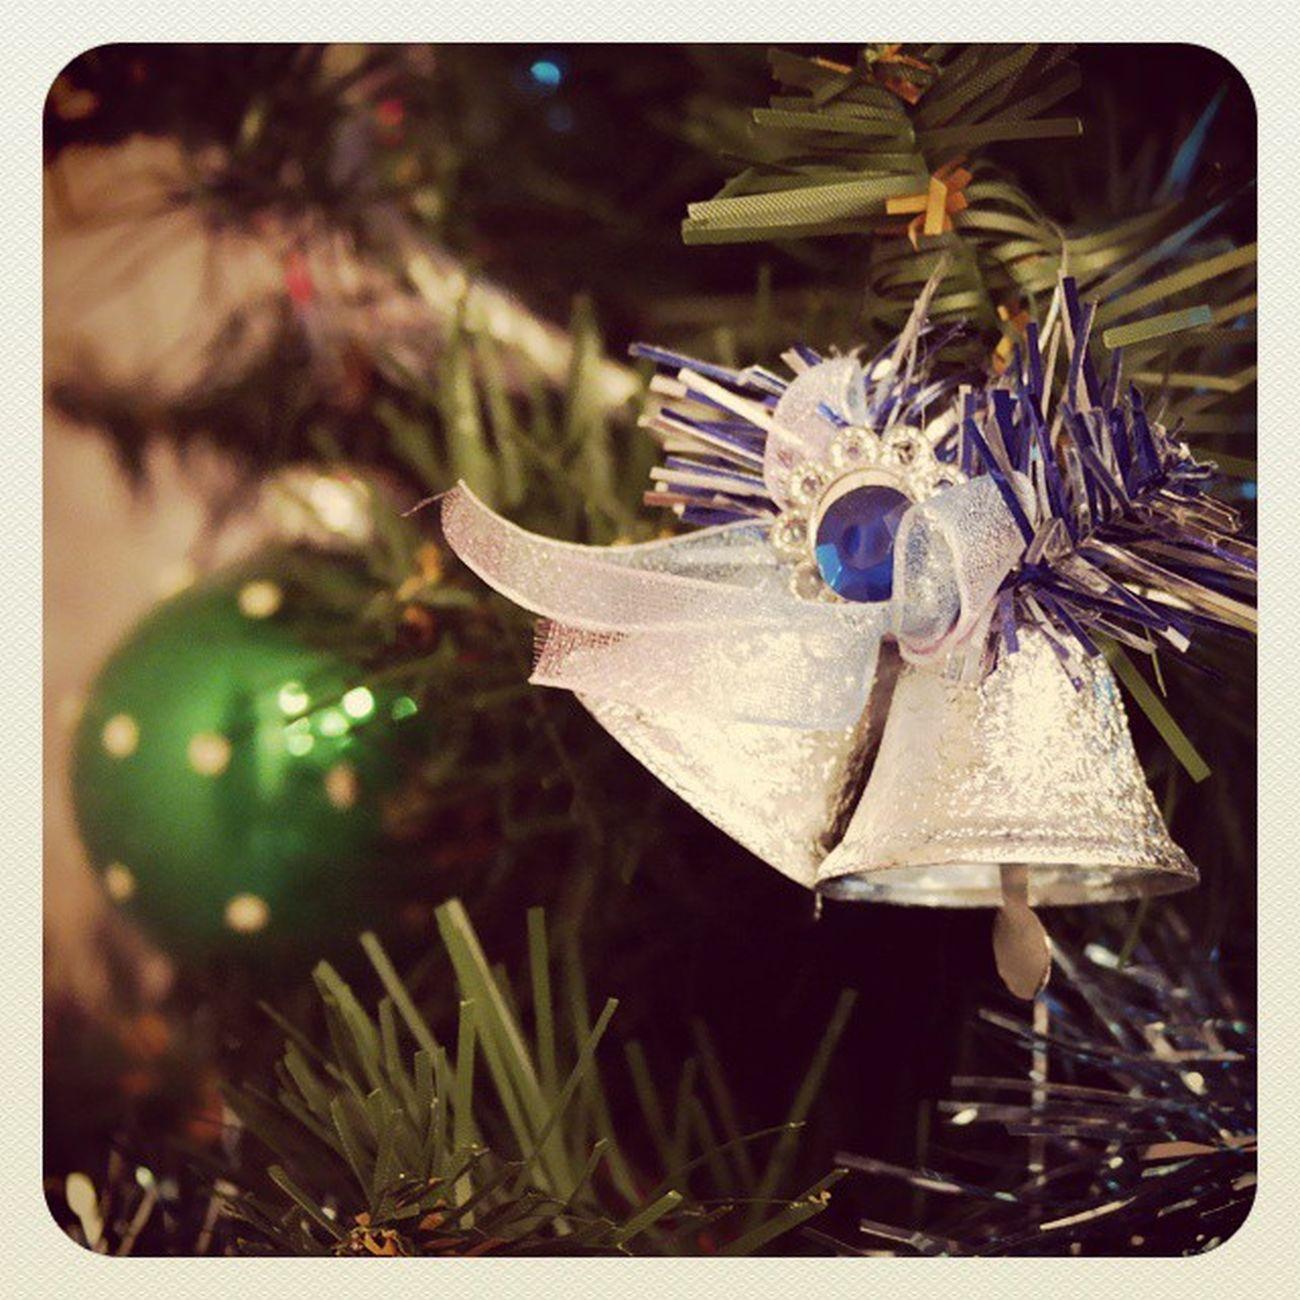 омск сибирь новыйгод рождество ёлка колокольчик ретро зима Omsk Siberia NewYear Christmas Christmastree Bell Ball Winter Retro